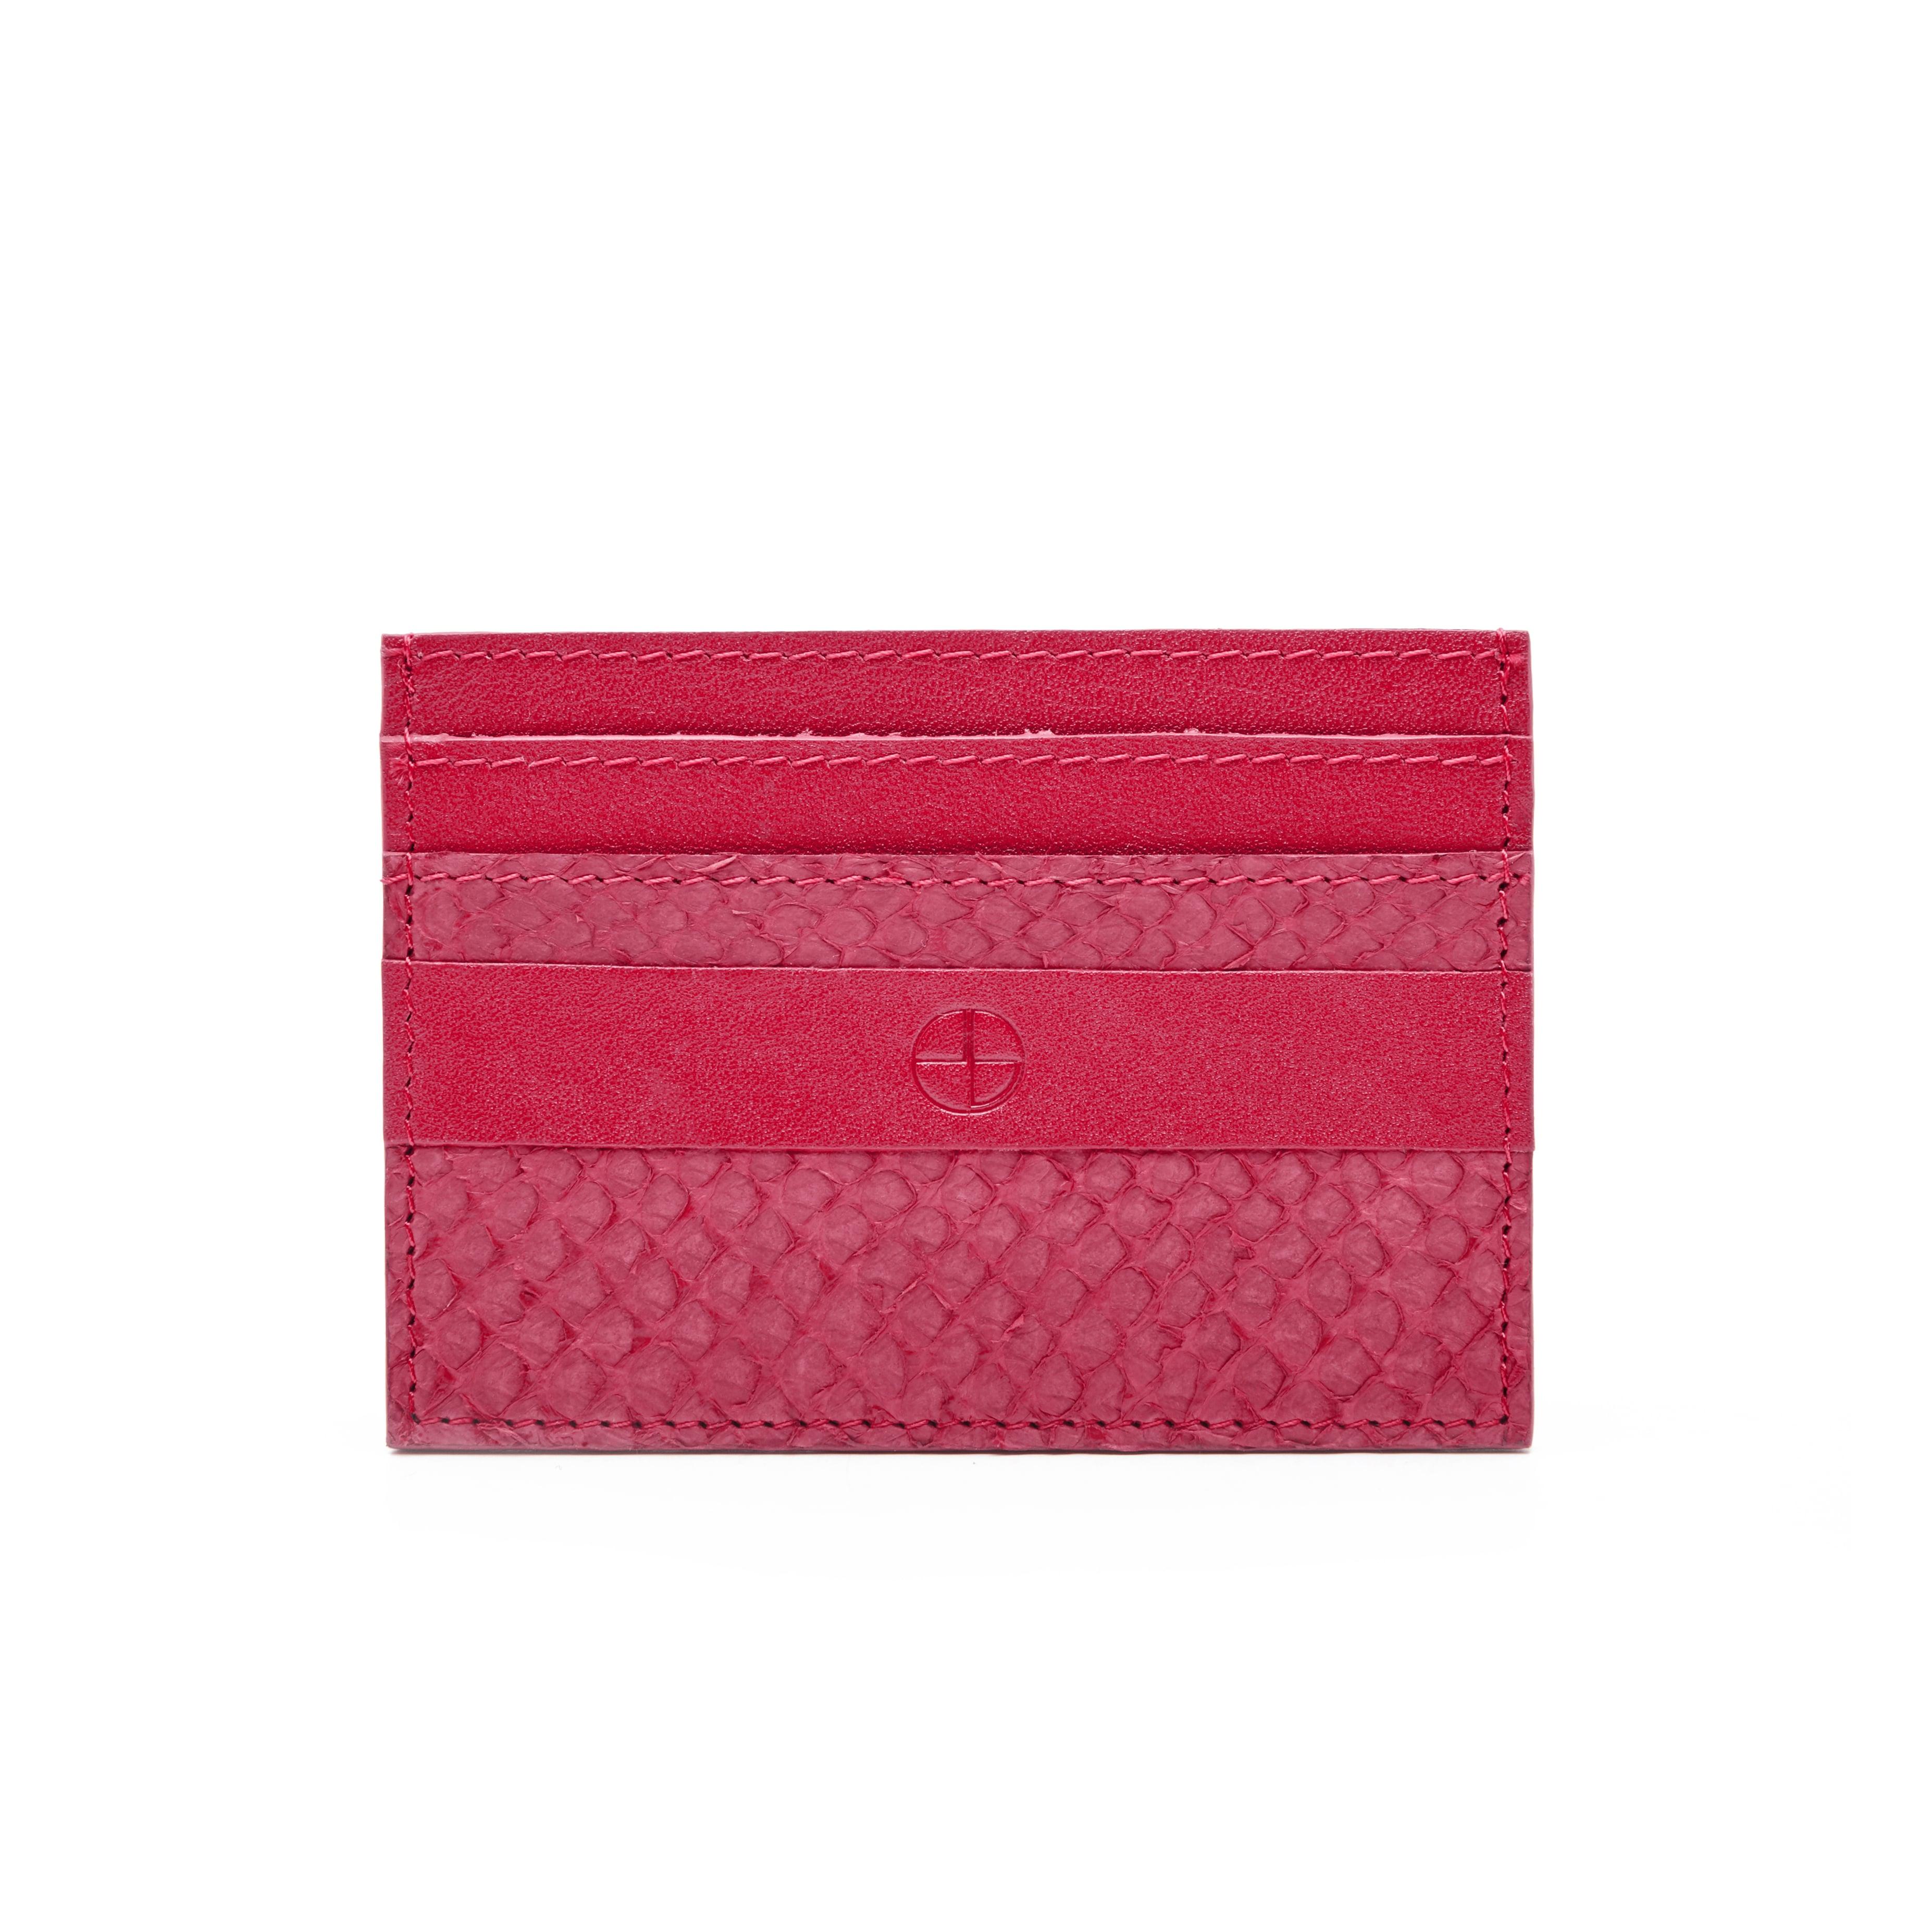 Midnight pink salmon leather credit card holder — STUDIO EBN